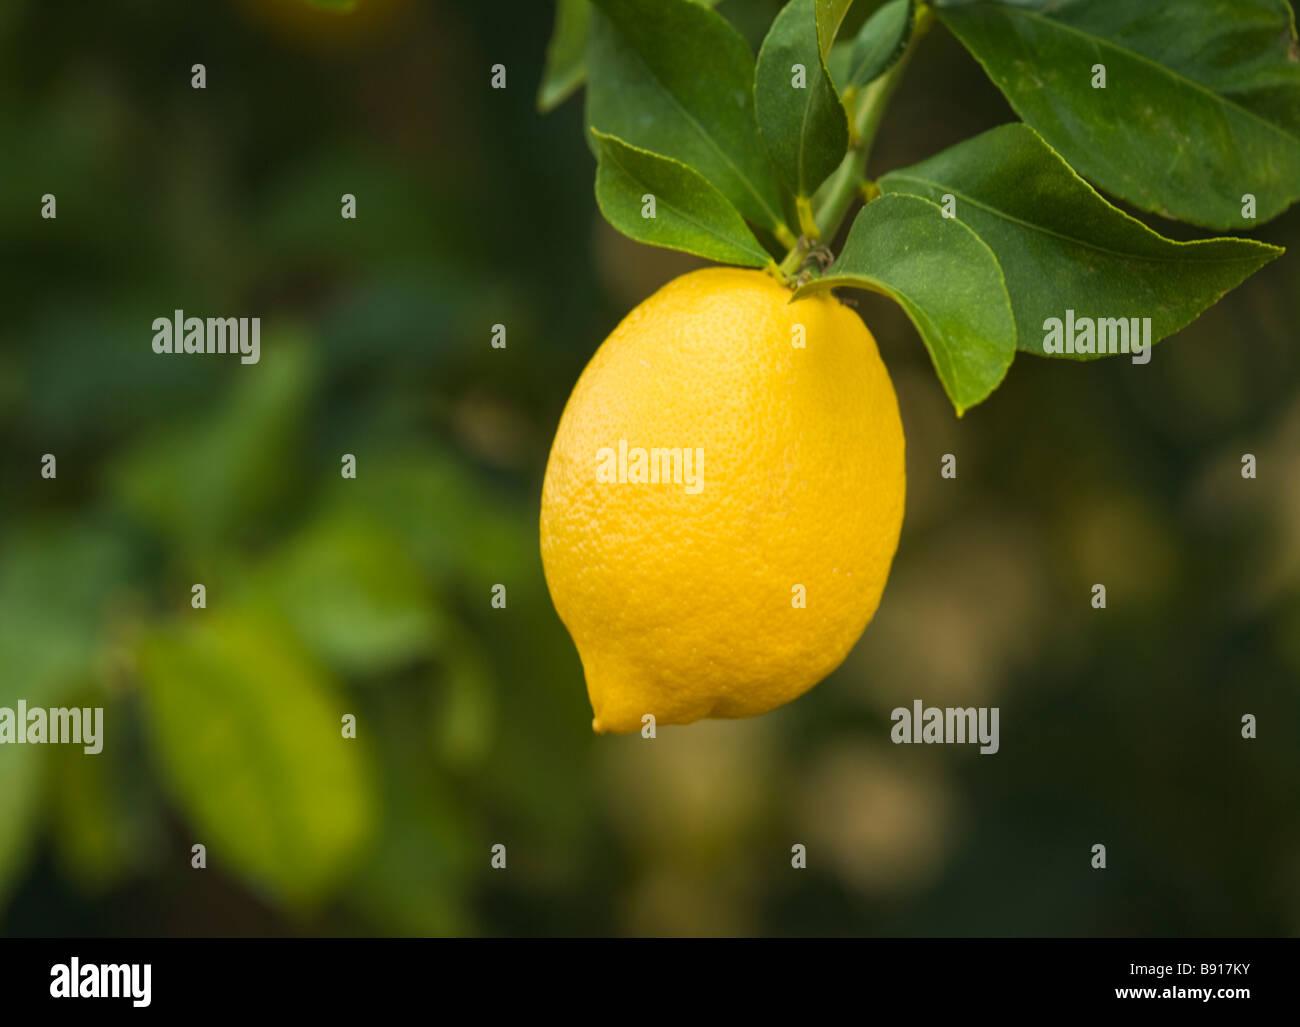 Lemon 'Lisbon'  variety hanging on branch. - Stock Image